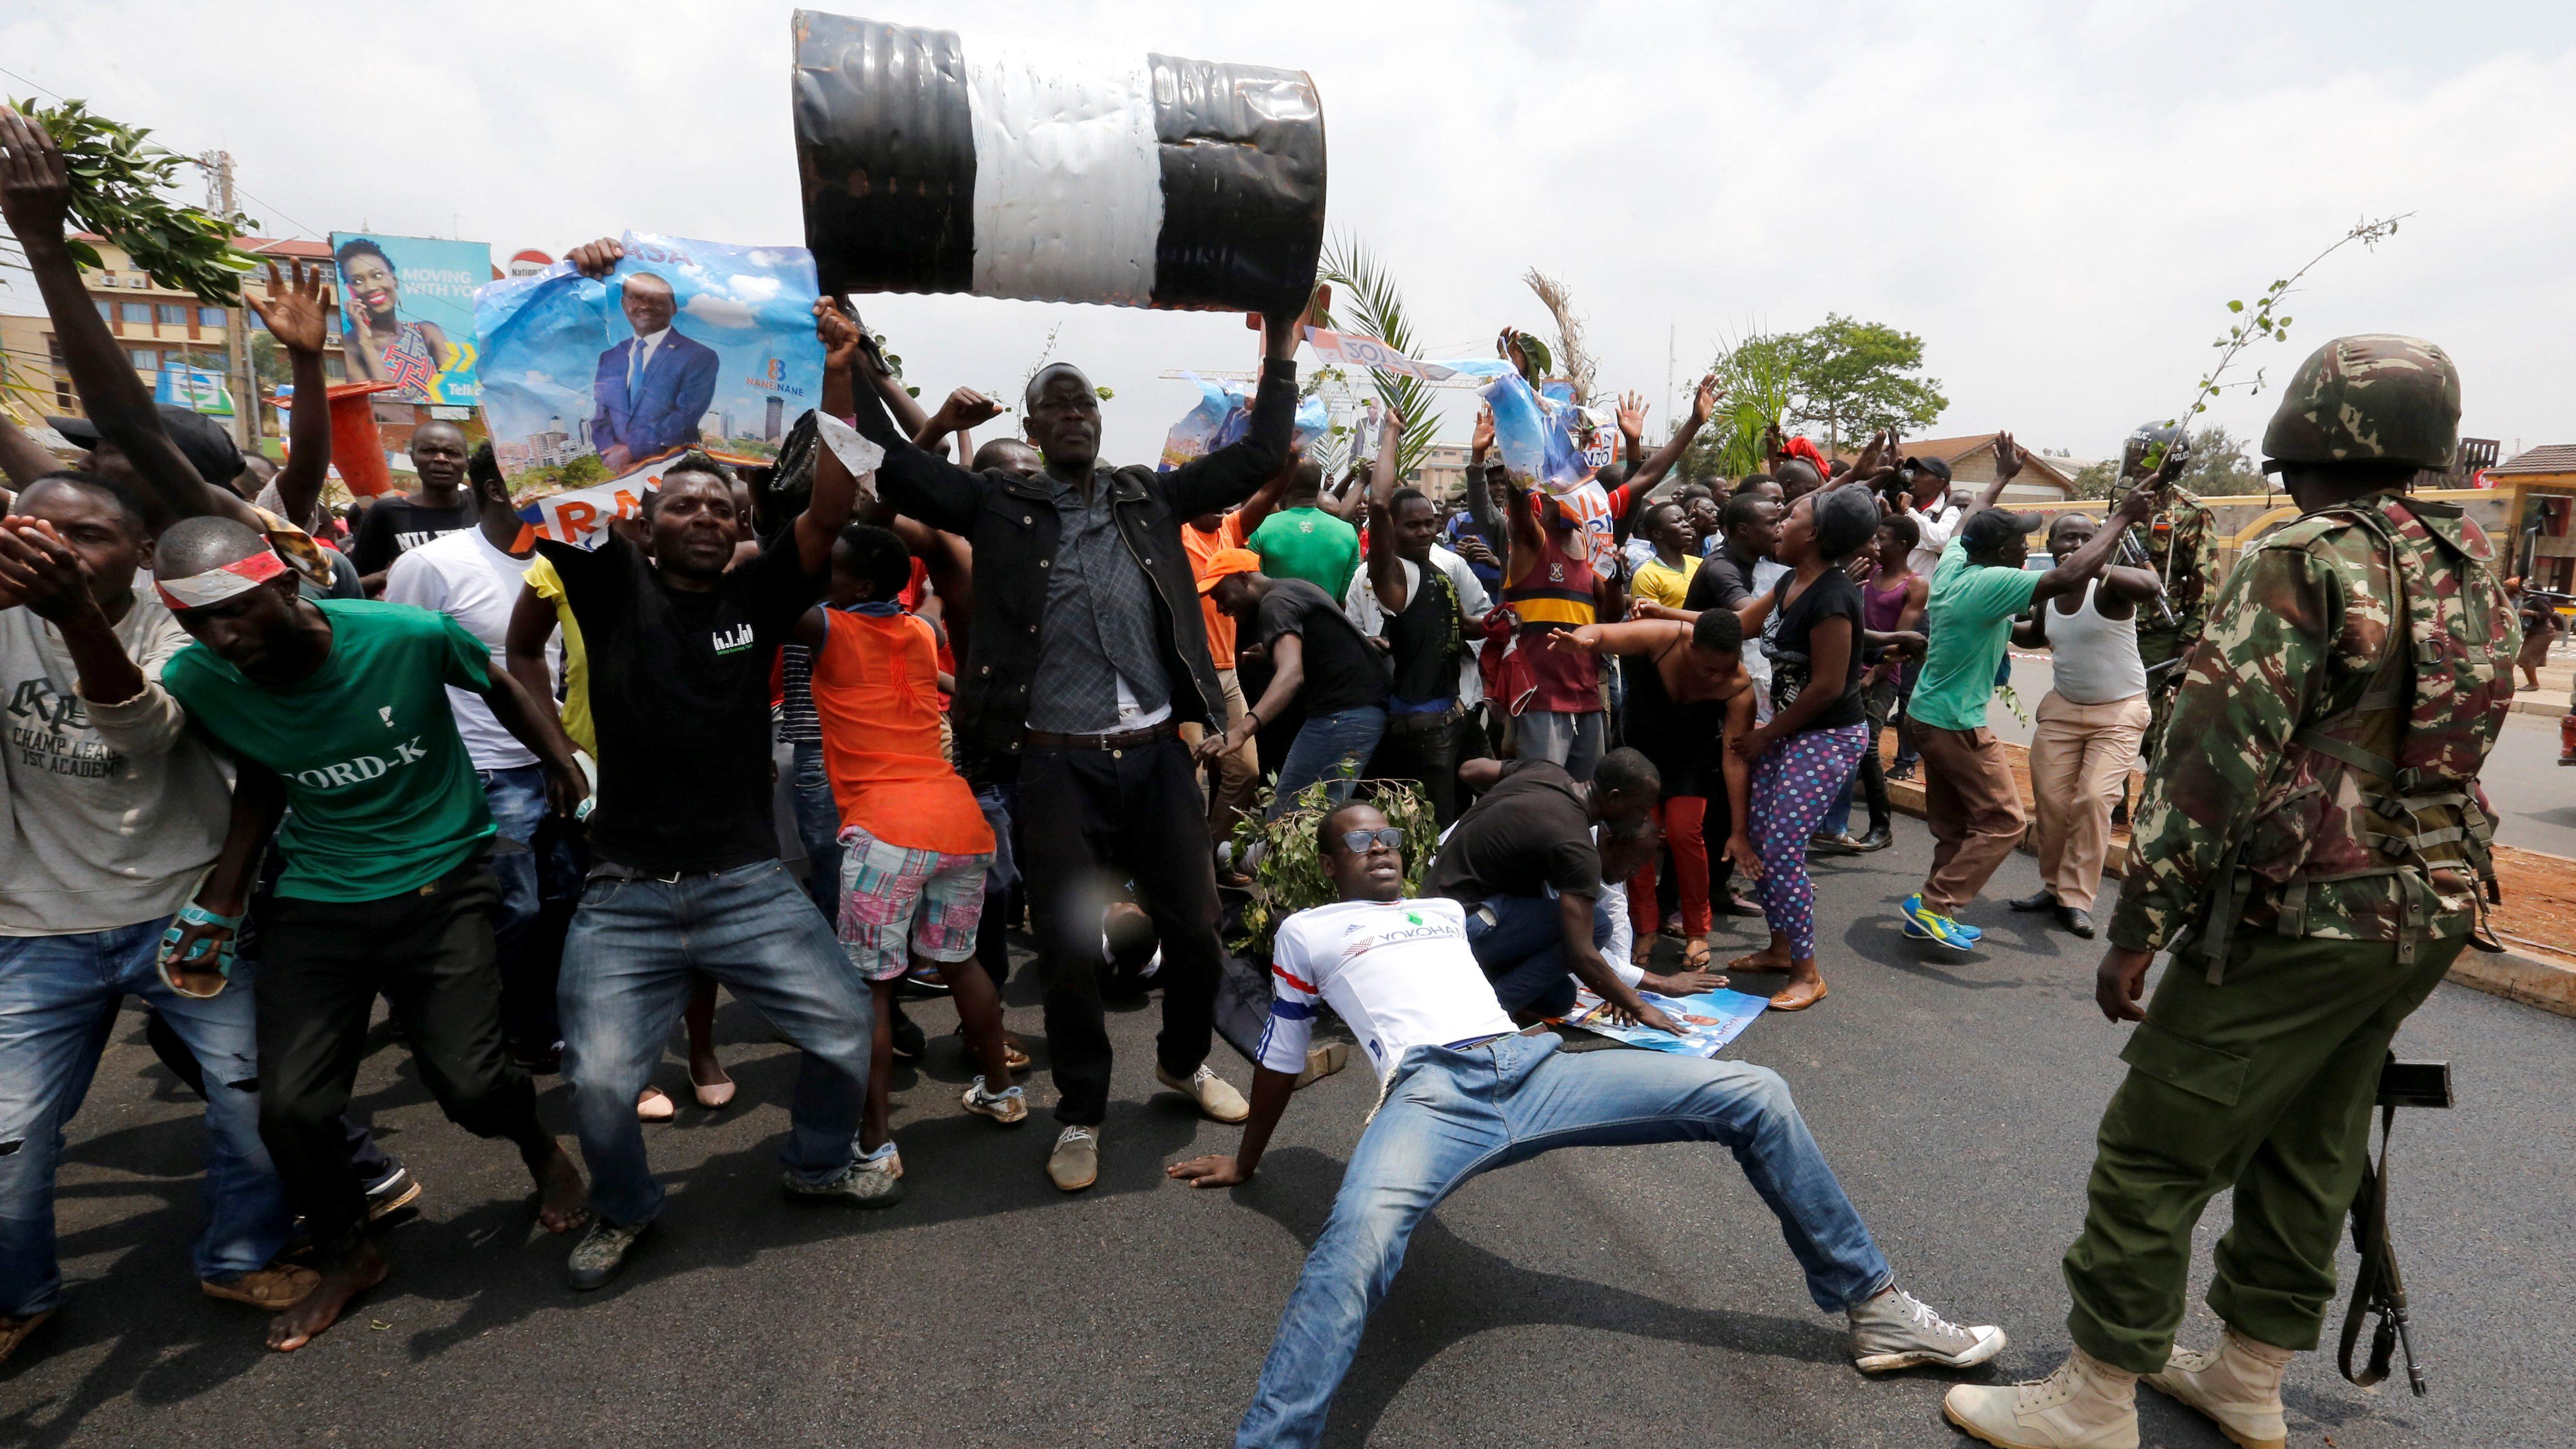 Celebrations in Kibera slum after president Uhuru Kenyatta's election win was declared invalid by a court in Nairobi, Kenya, September 1, 2017.